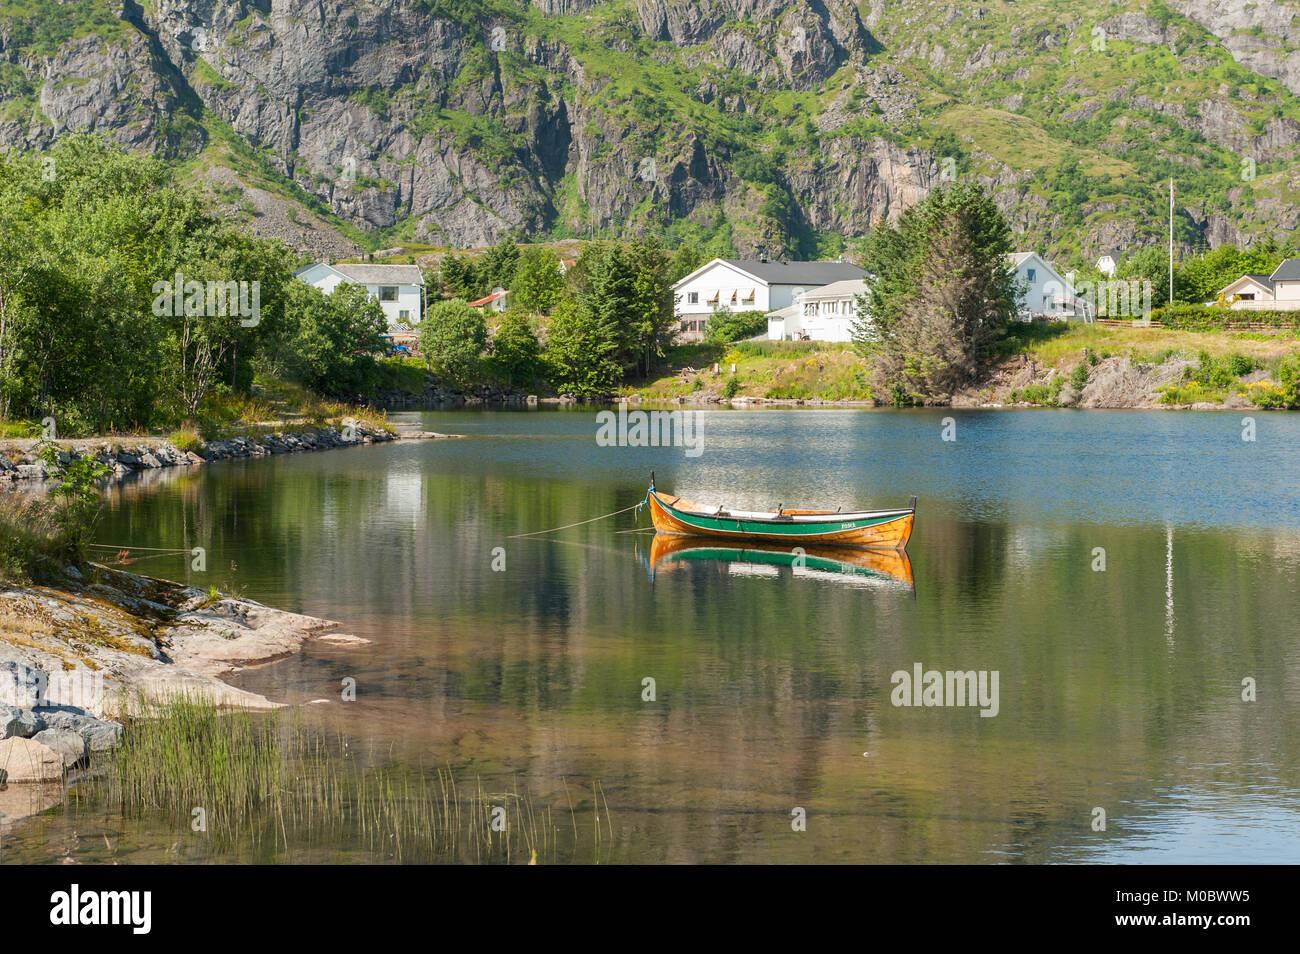 Summer landscape at Sorvagen on Lofoten islands in northern Norway - Stock Image